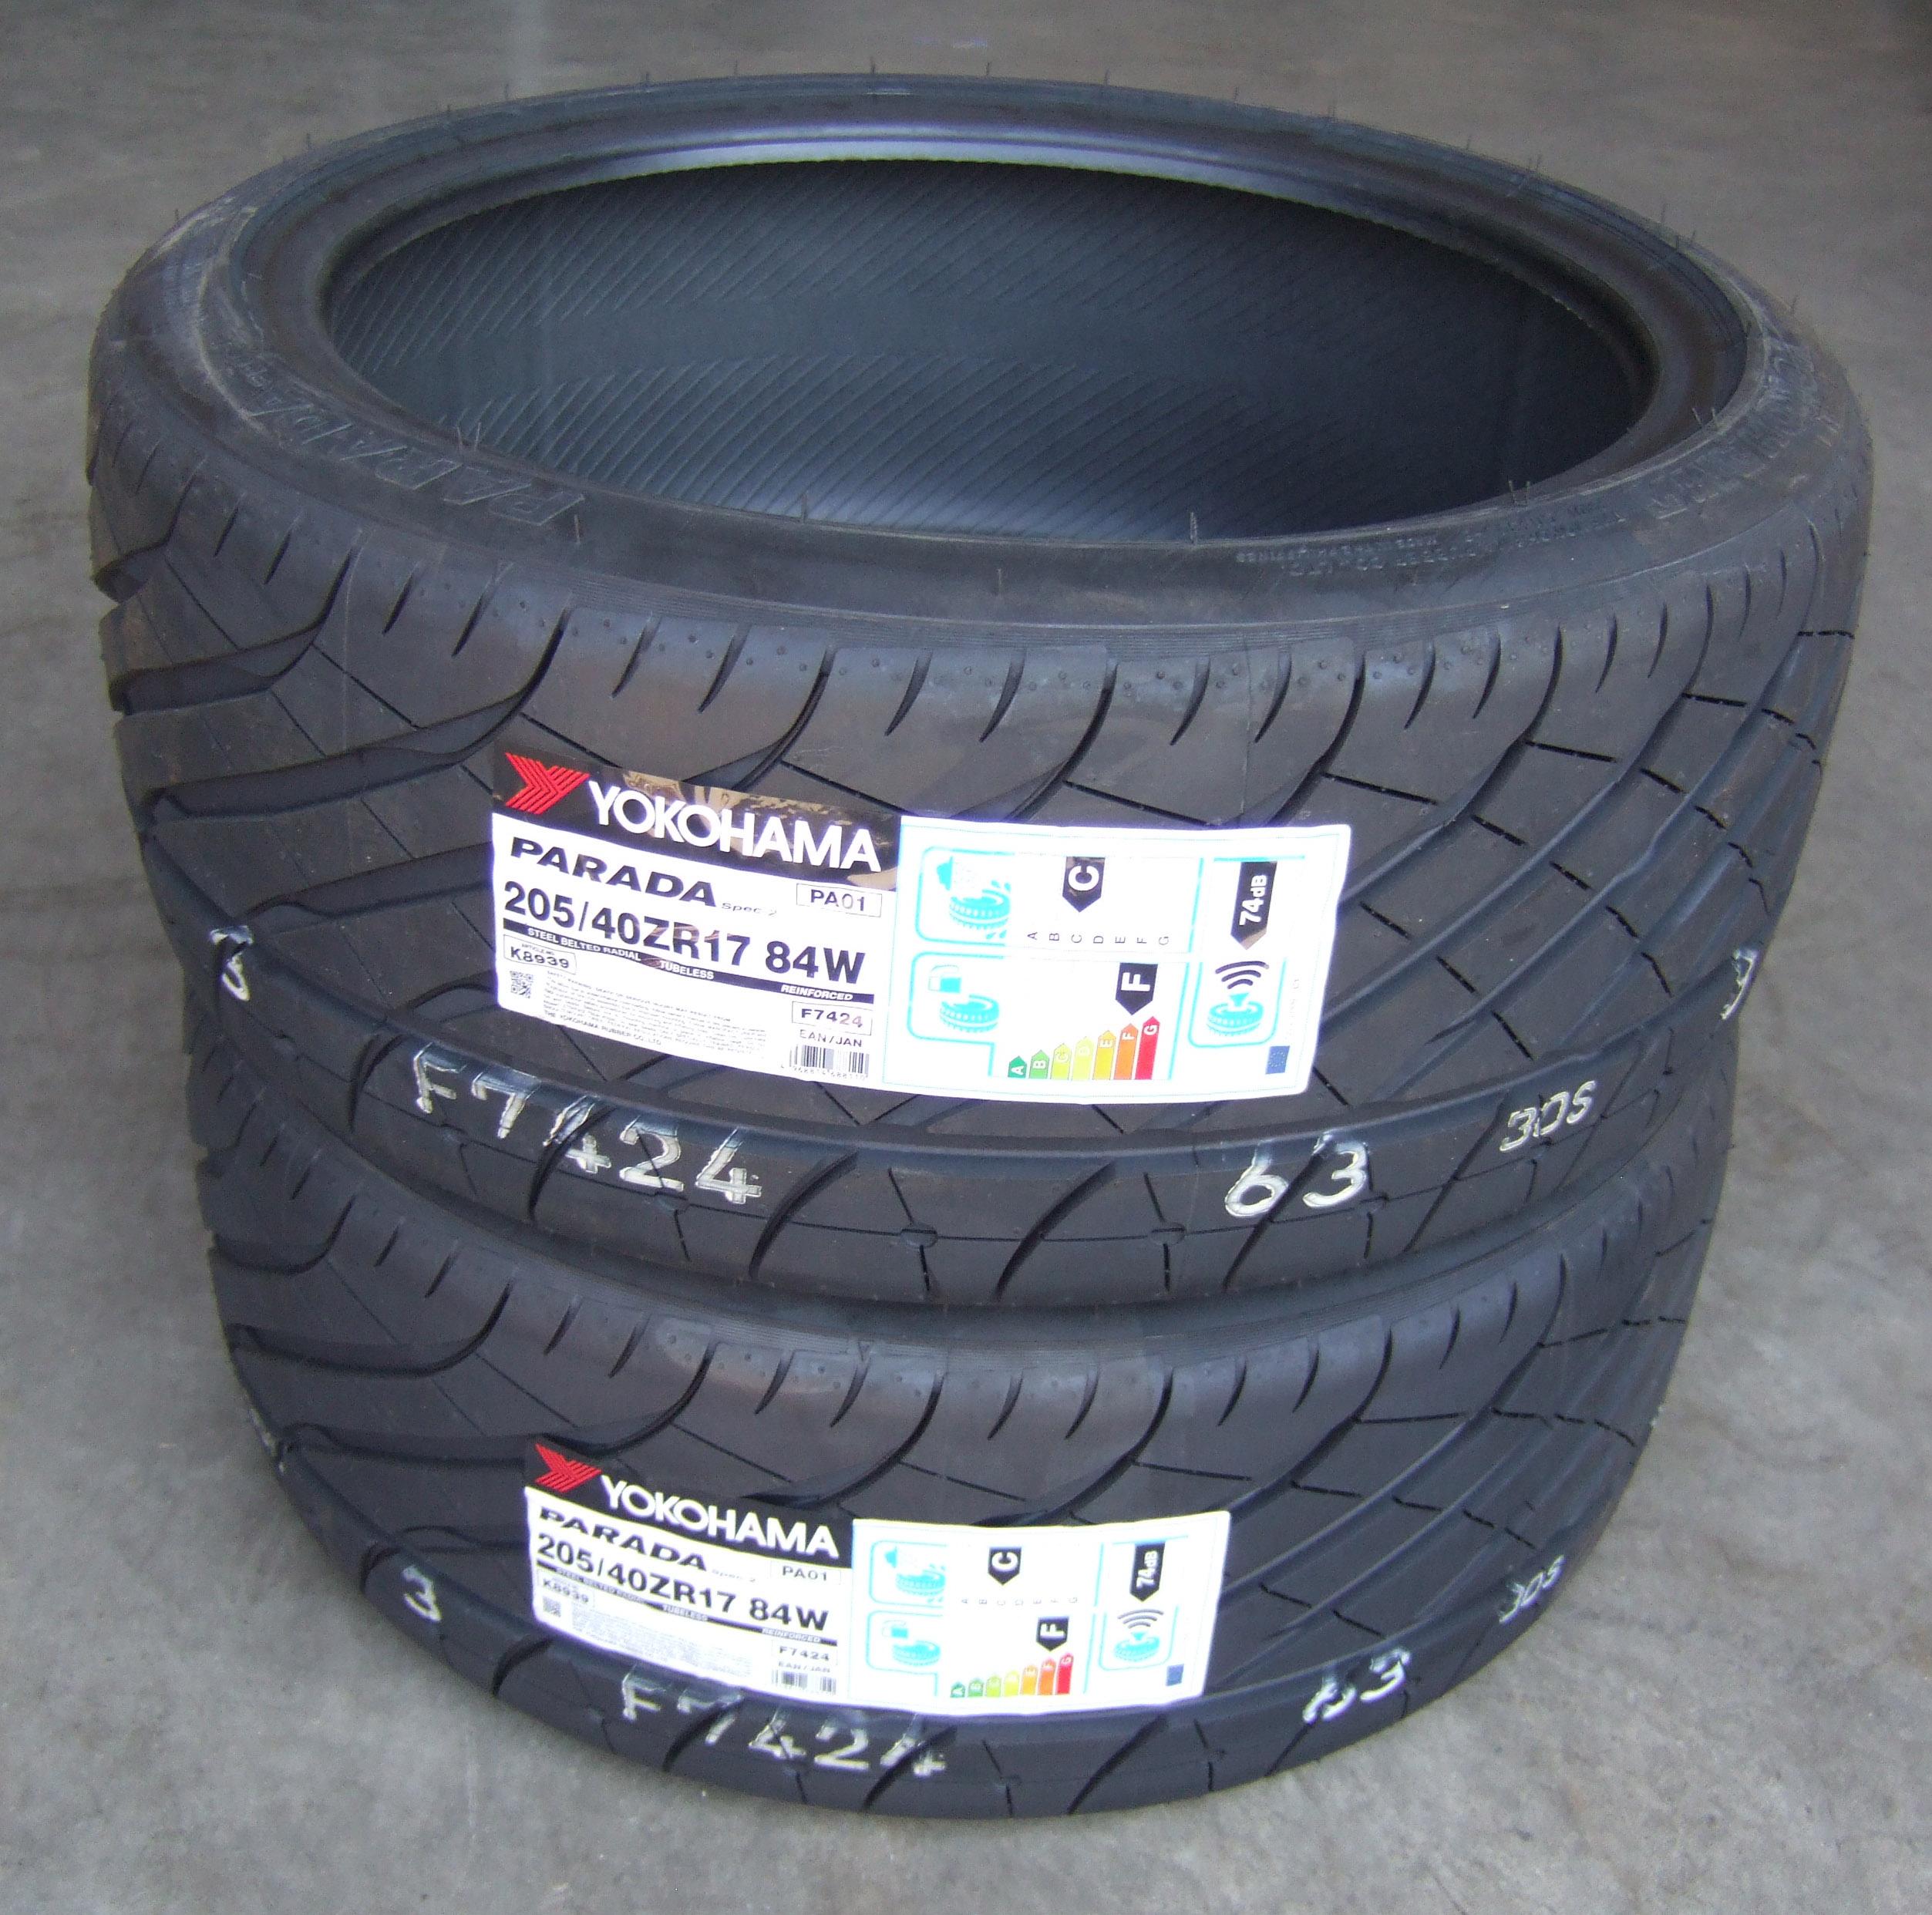 x2 205 40 17 yokohama parada spec 2 tyres 2054017 84w 205. Black Bedroom Furniture Sets. Home Design Ideas